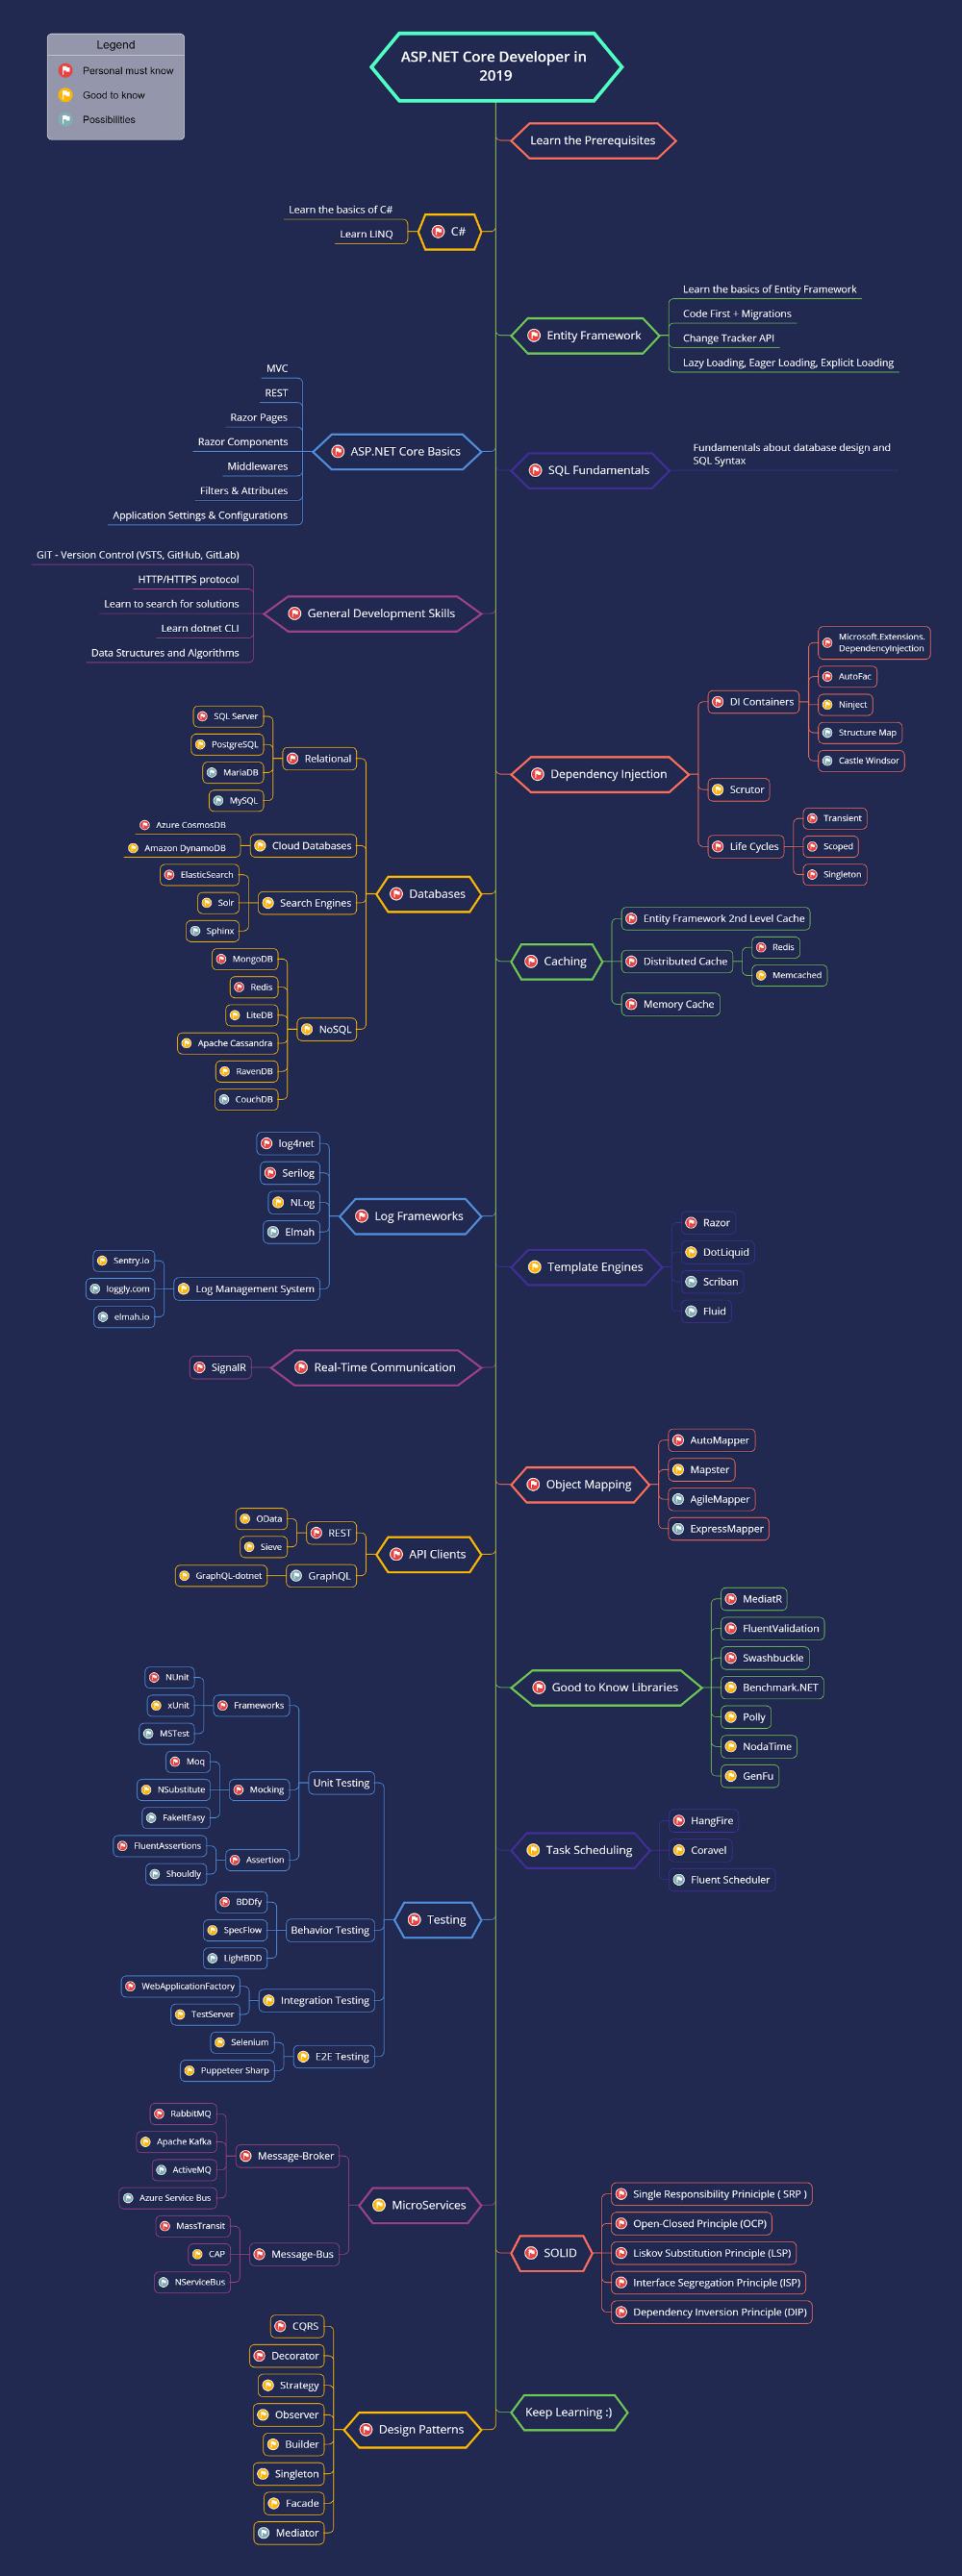 Github Moientajik Aspnetcore Developer Roadmap Roadmap To Becoming An Asp Net Core Developer In 2019 Roadmap Development Entity Framework